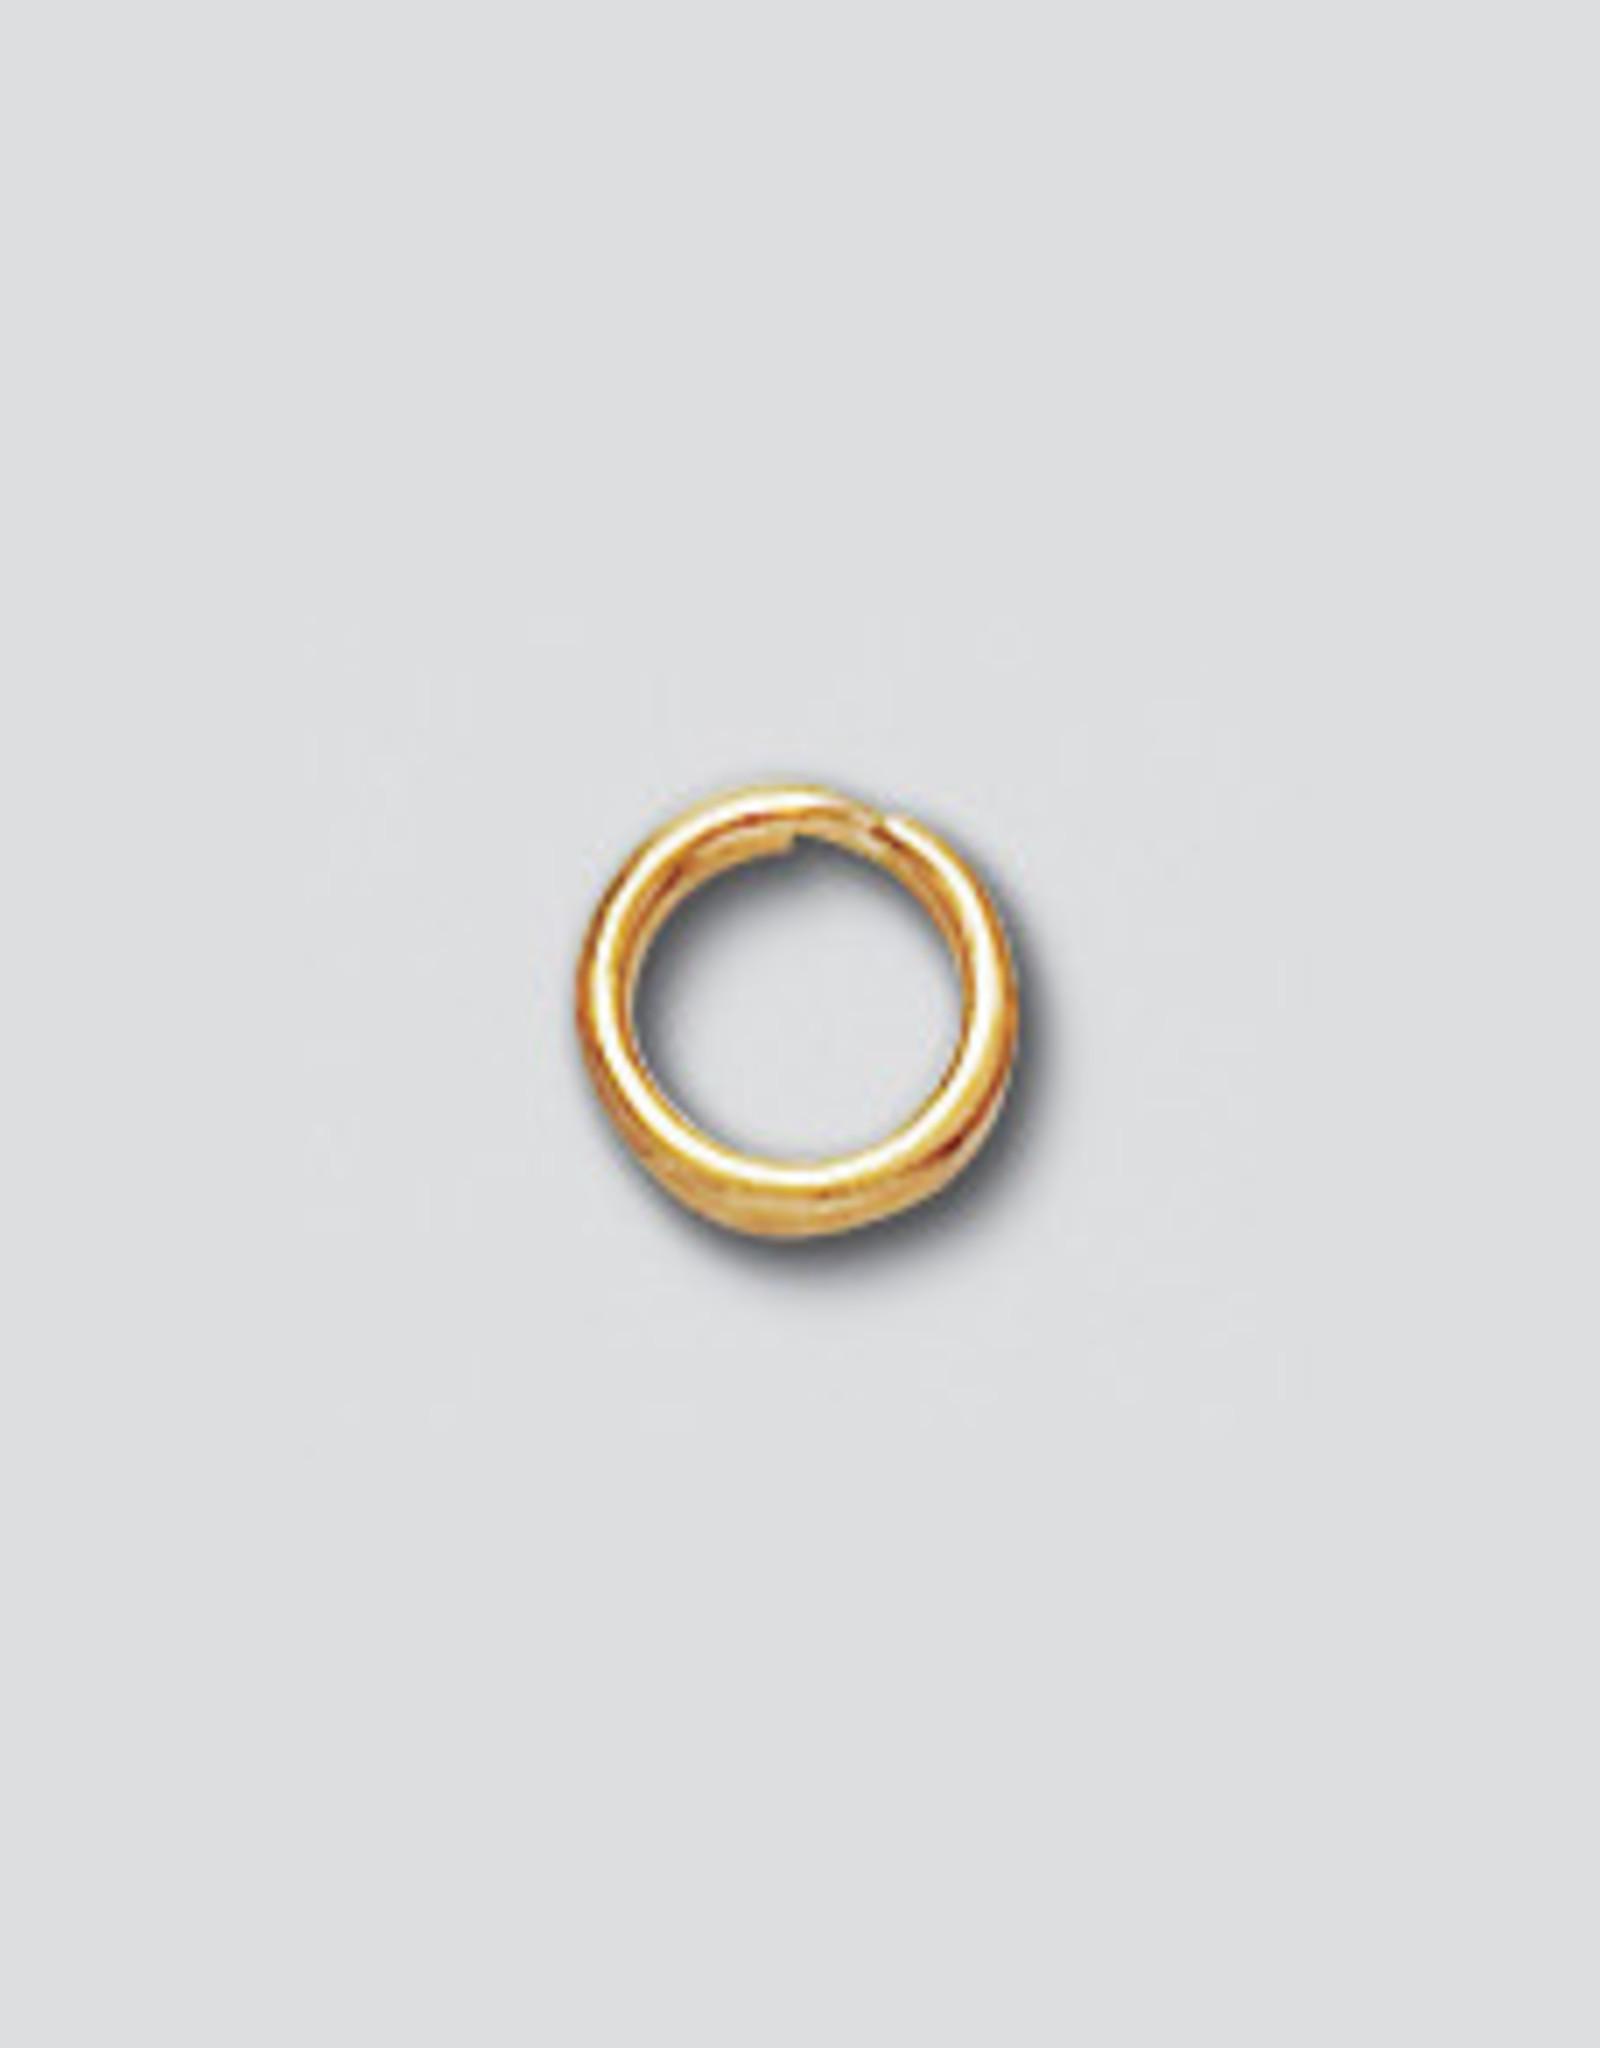 5mm Split Rings 14k Gold Filled Qty 10